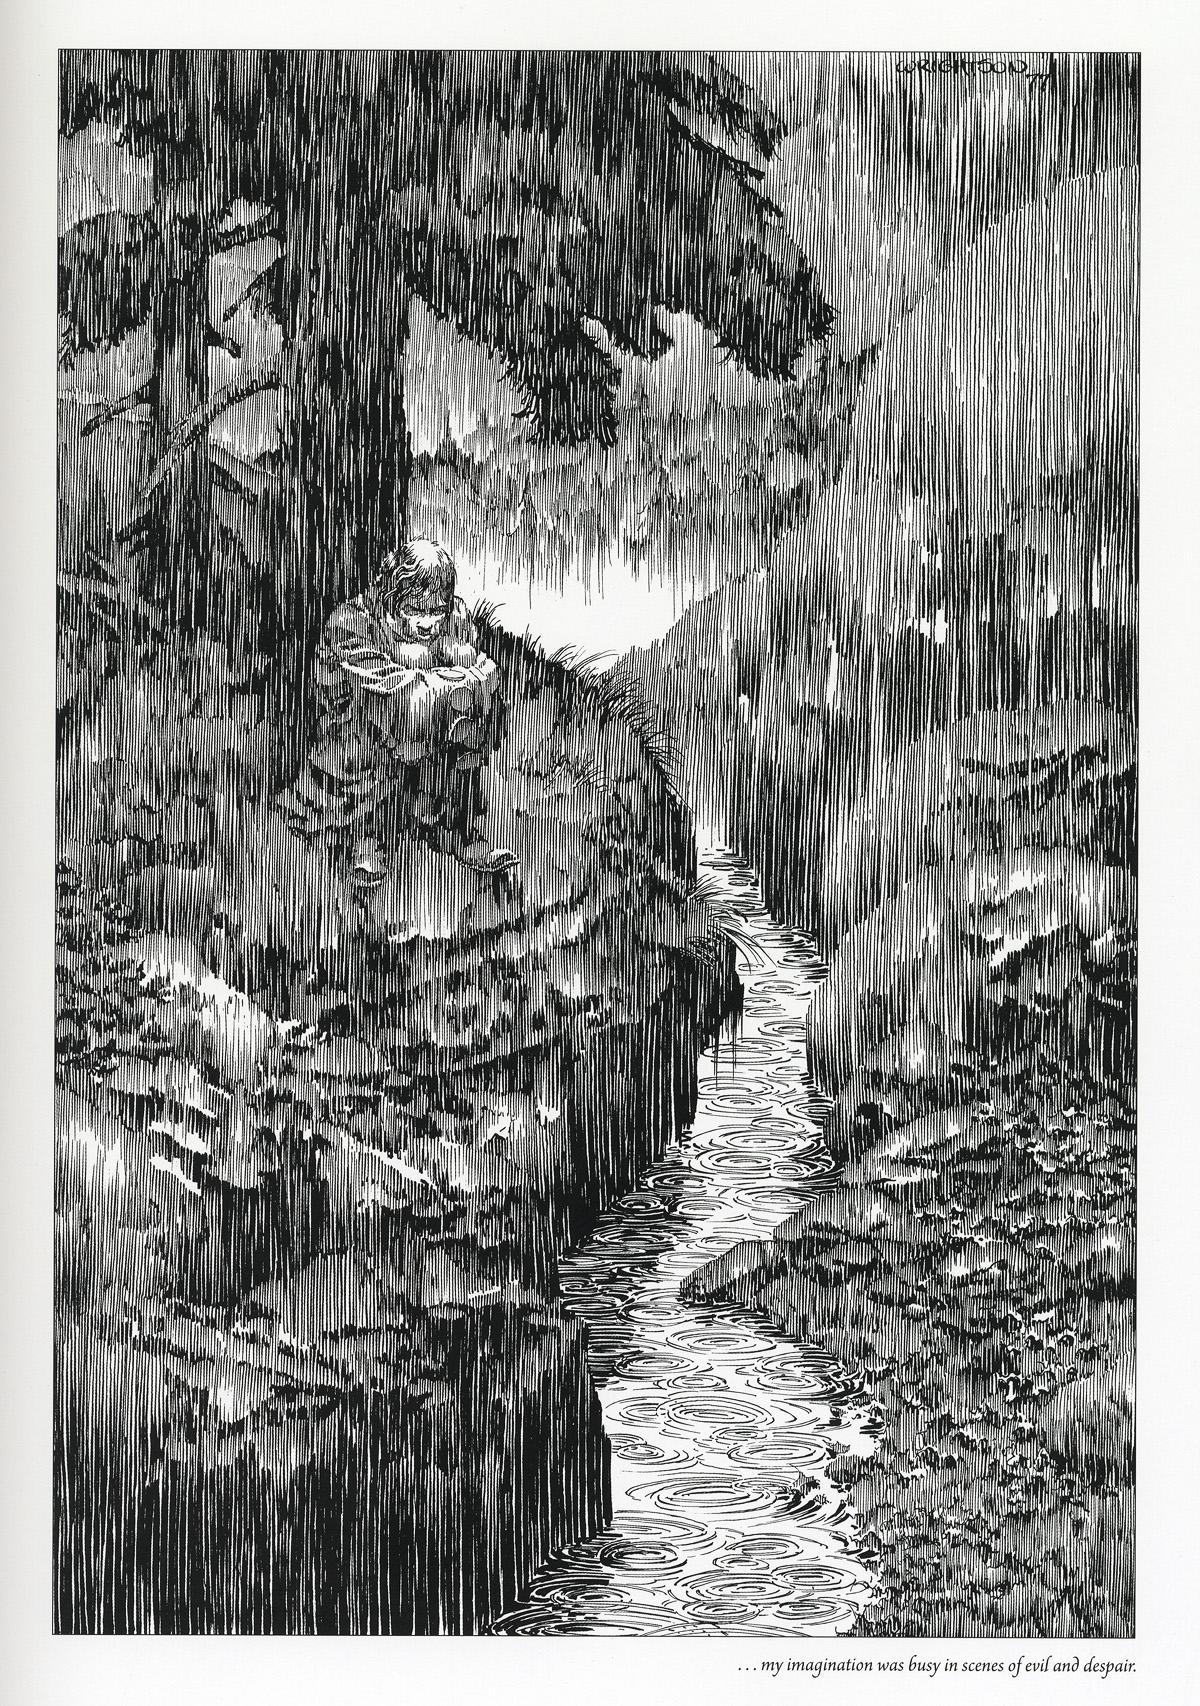 Drawn rain How draw rain to help